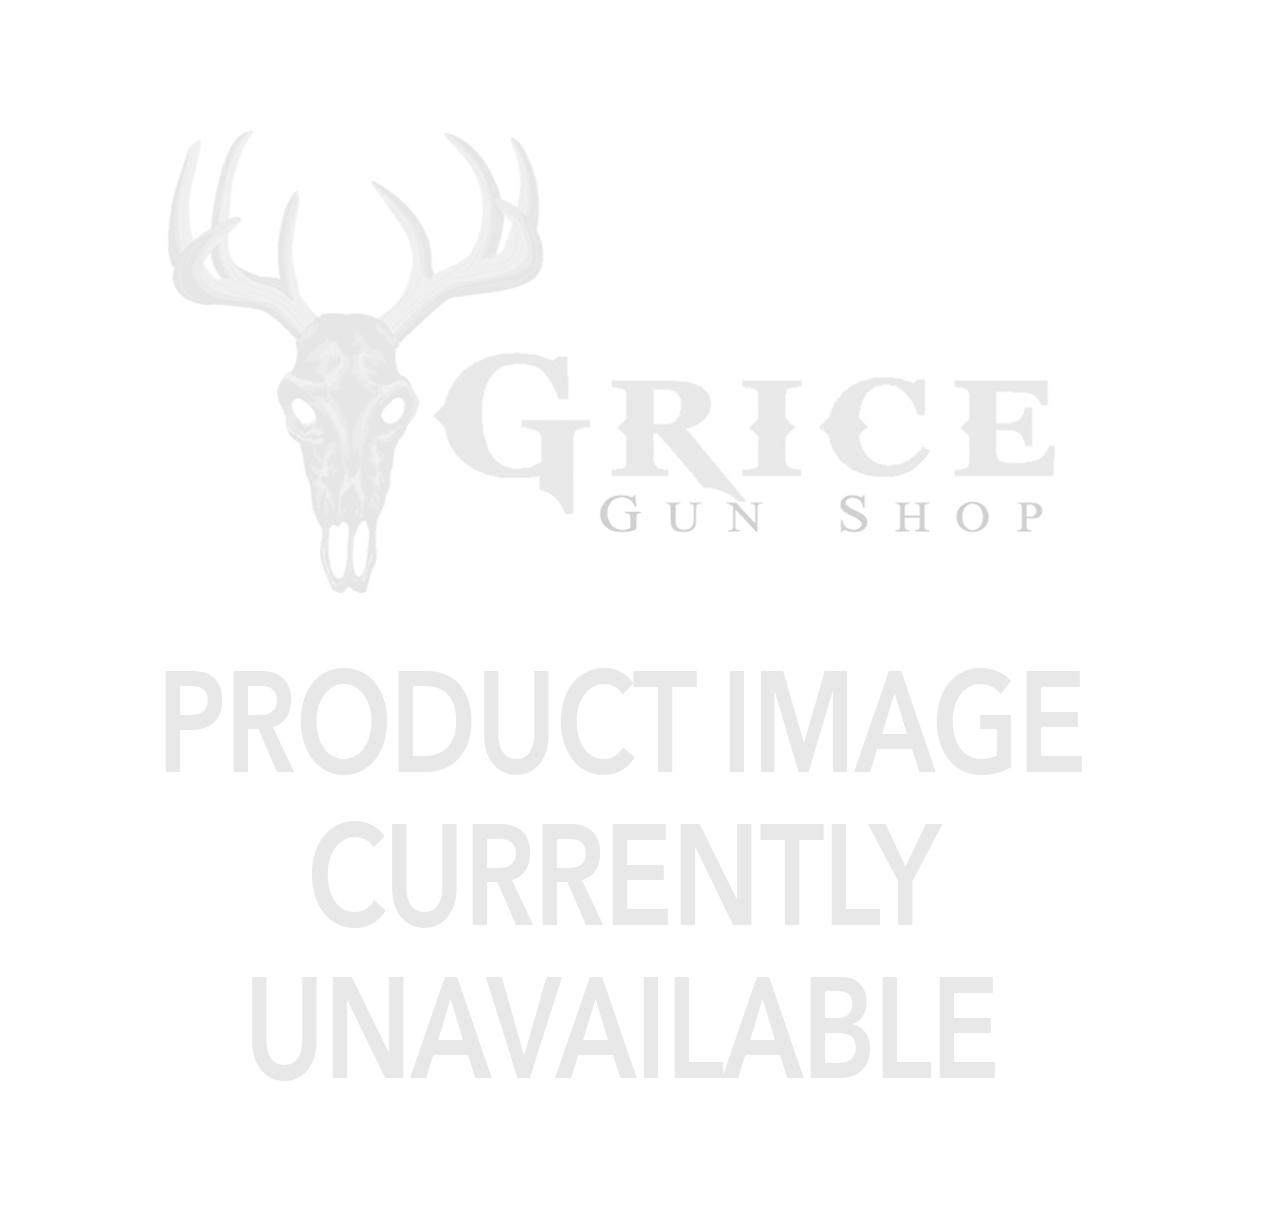 "Birchwood Casey - Freedom 20x35"" Single Stack Silhouette & Base"